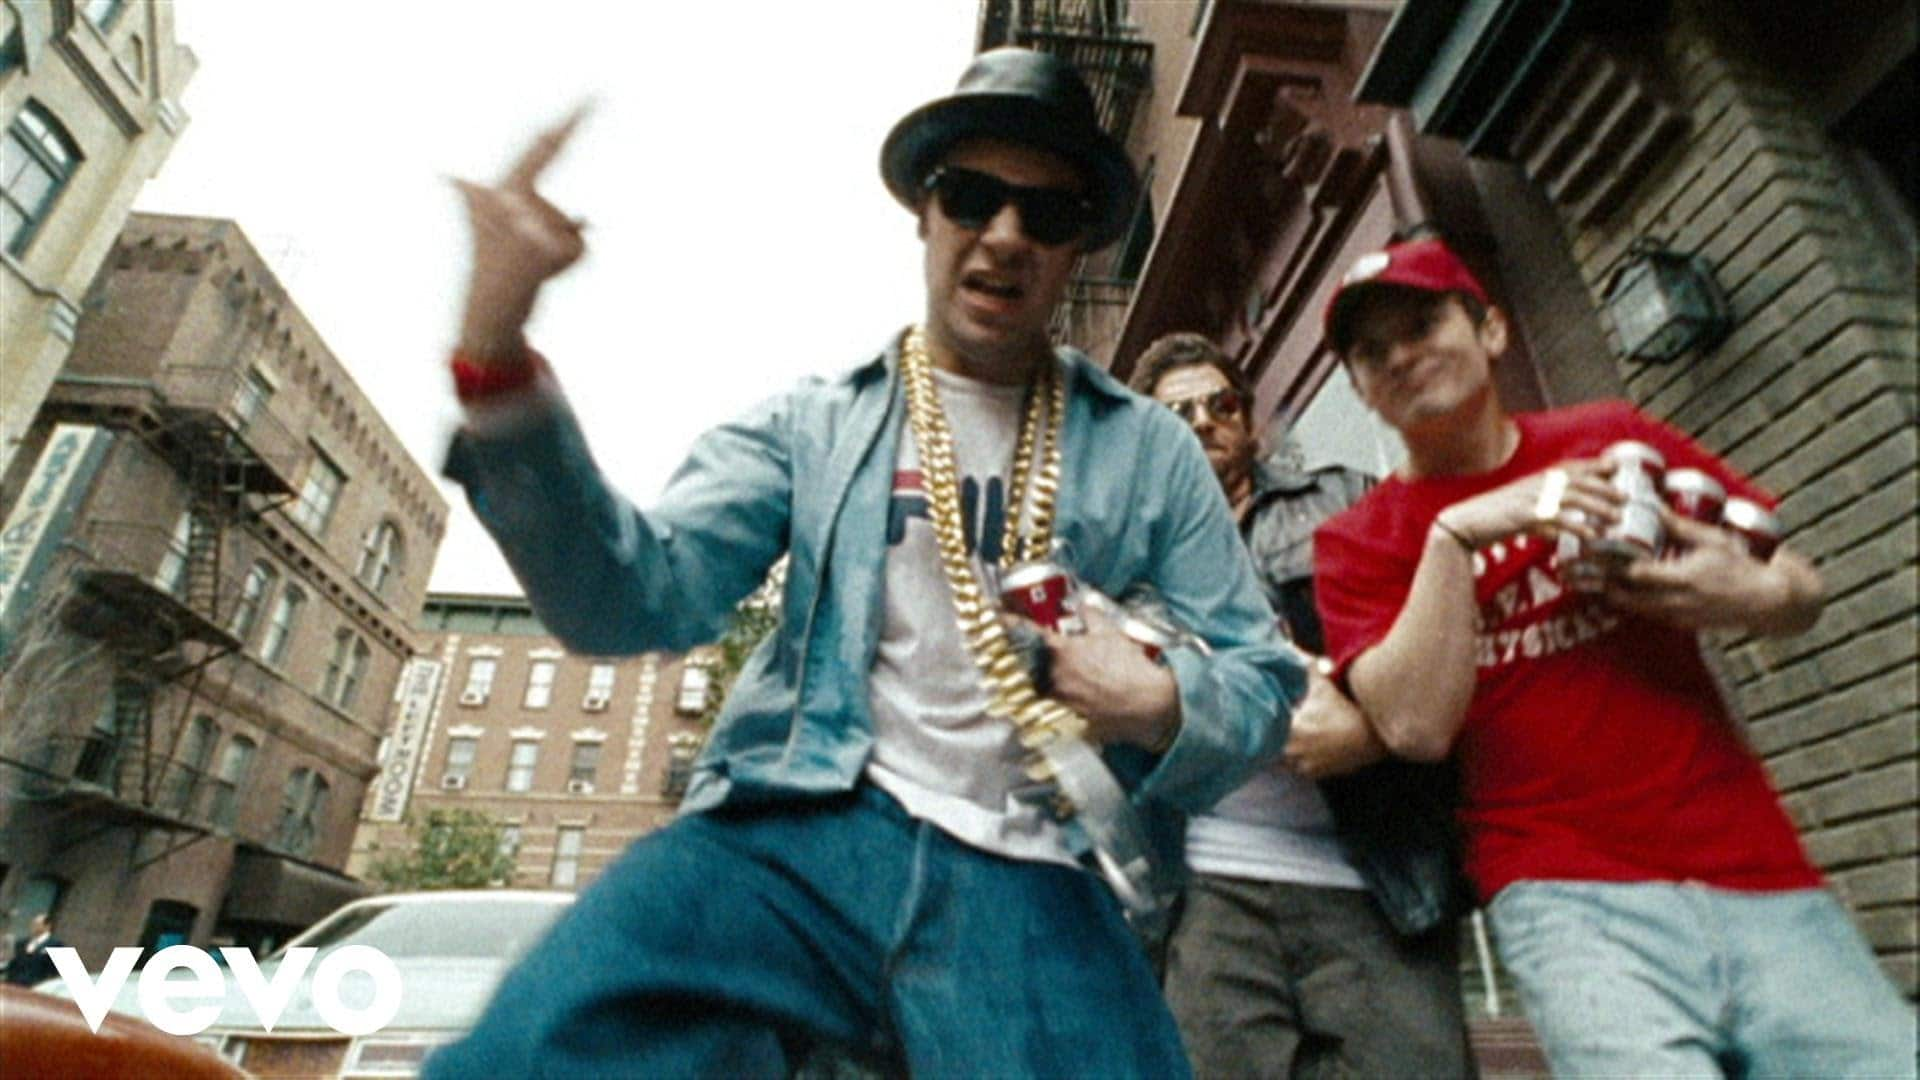 Beastie Boys – Make Some Noise